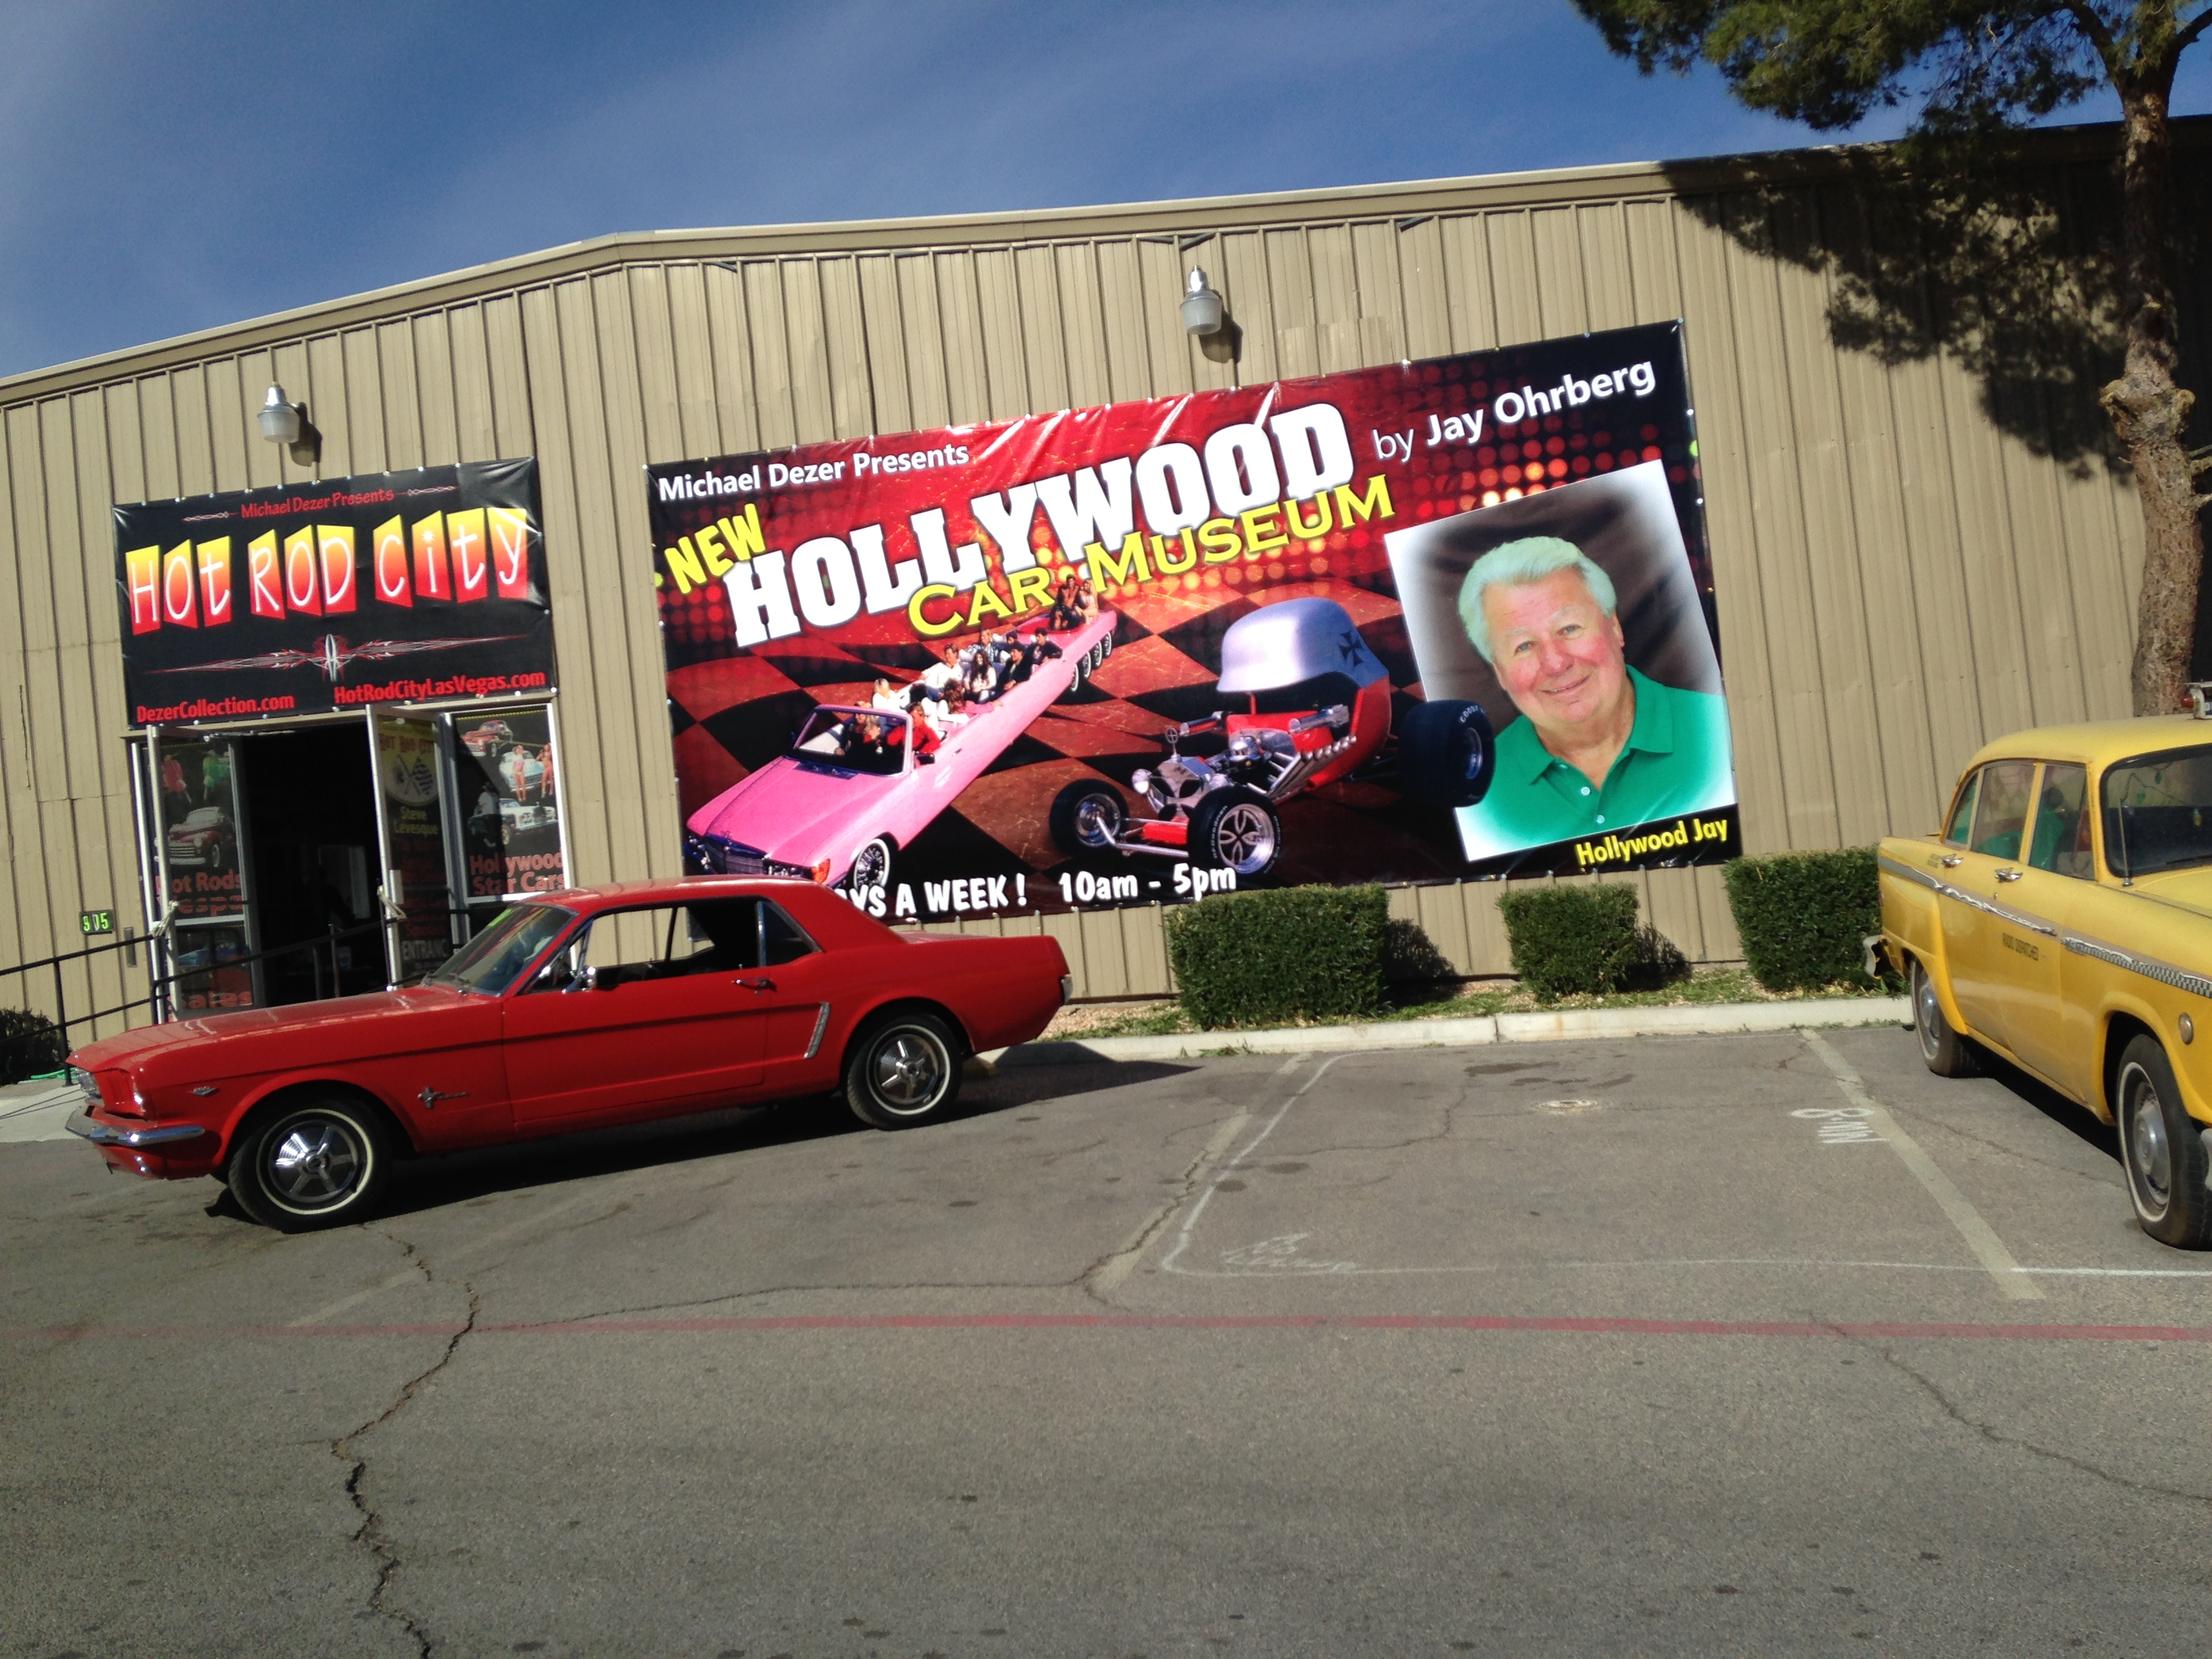 File:Hollywood Cars Museum at Hot Rod City Las Vegas.JPG ...